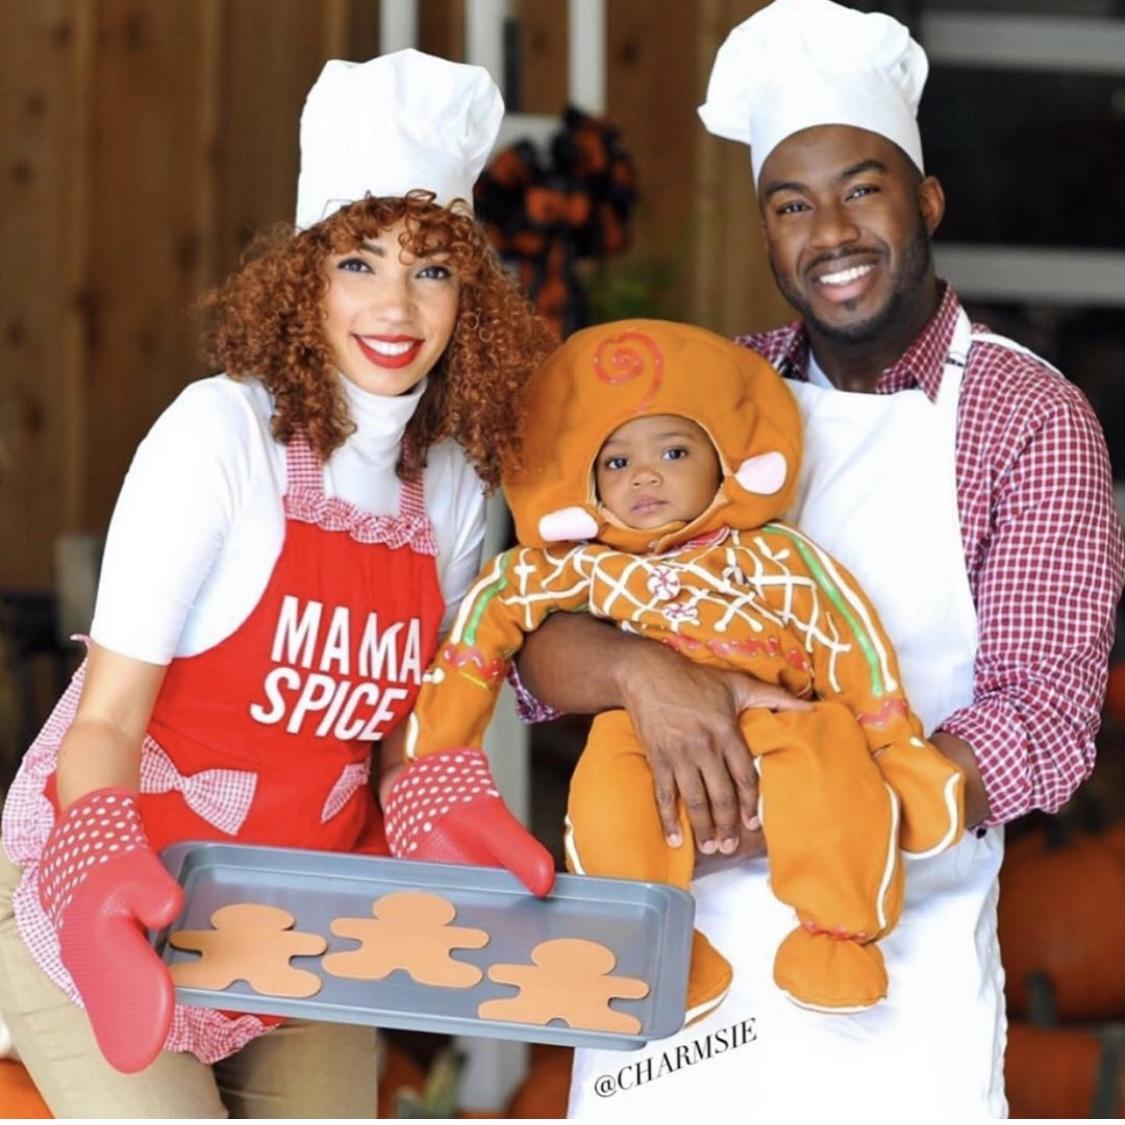 Gingerbread Man @charmsie